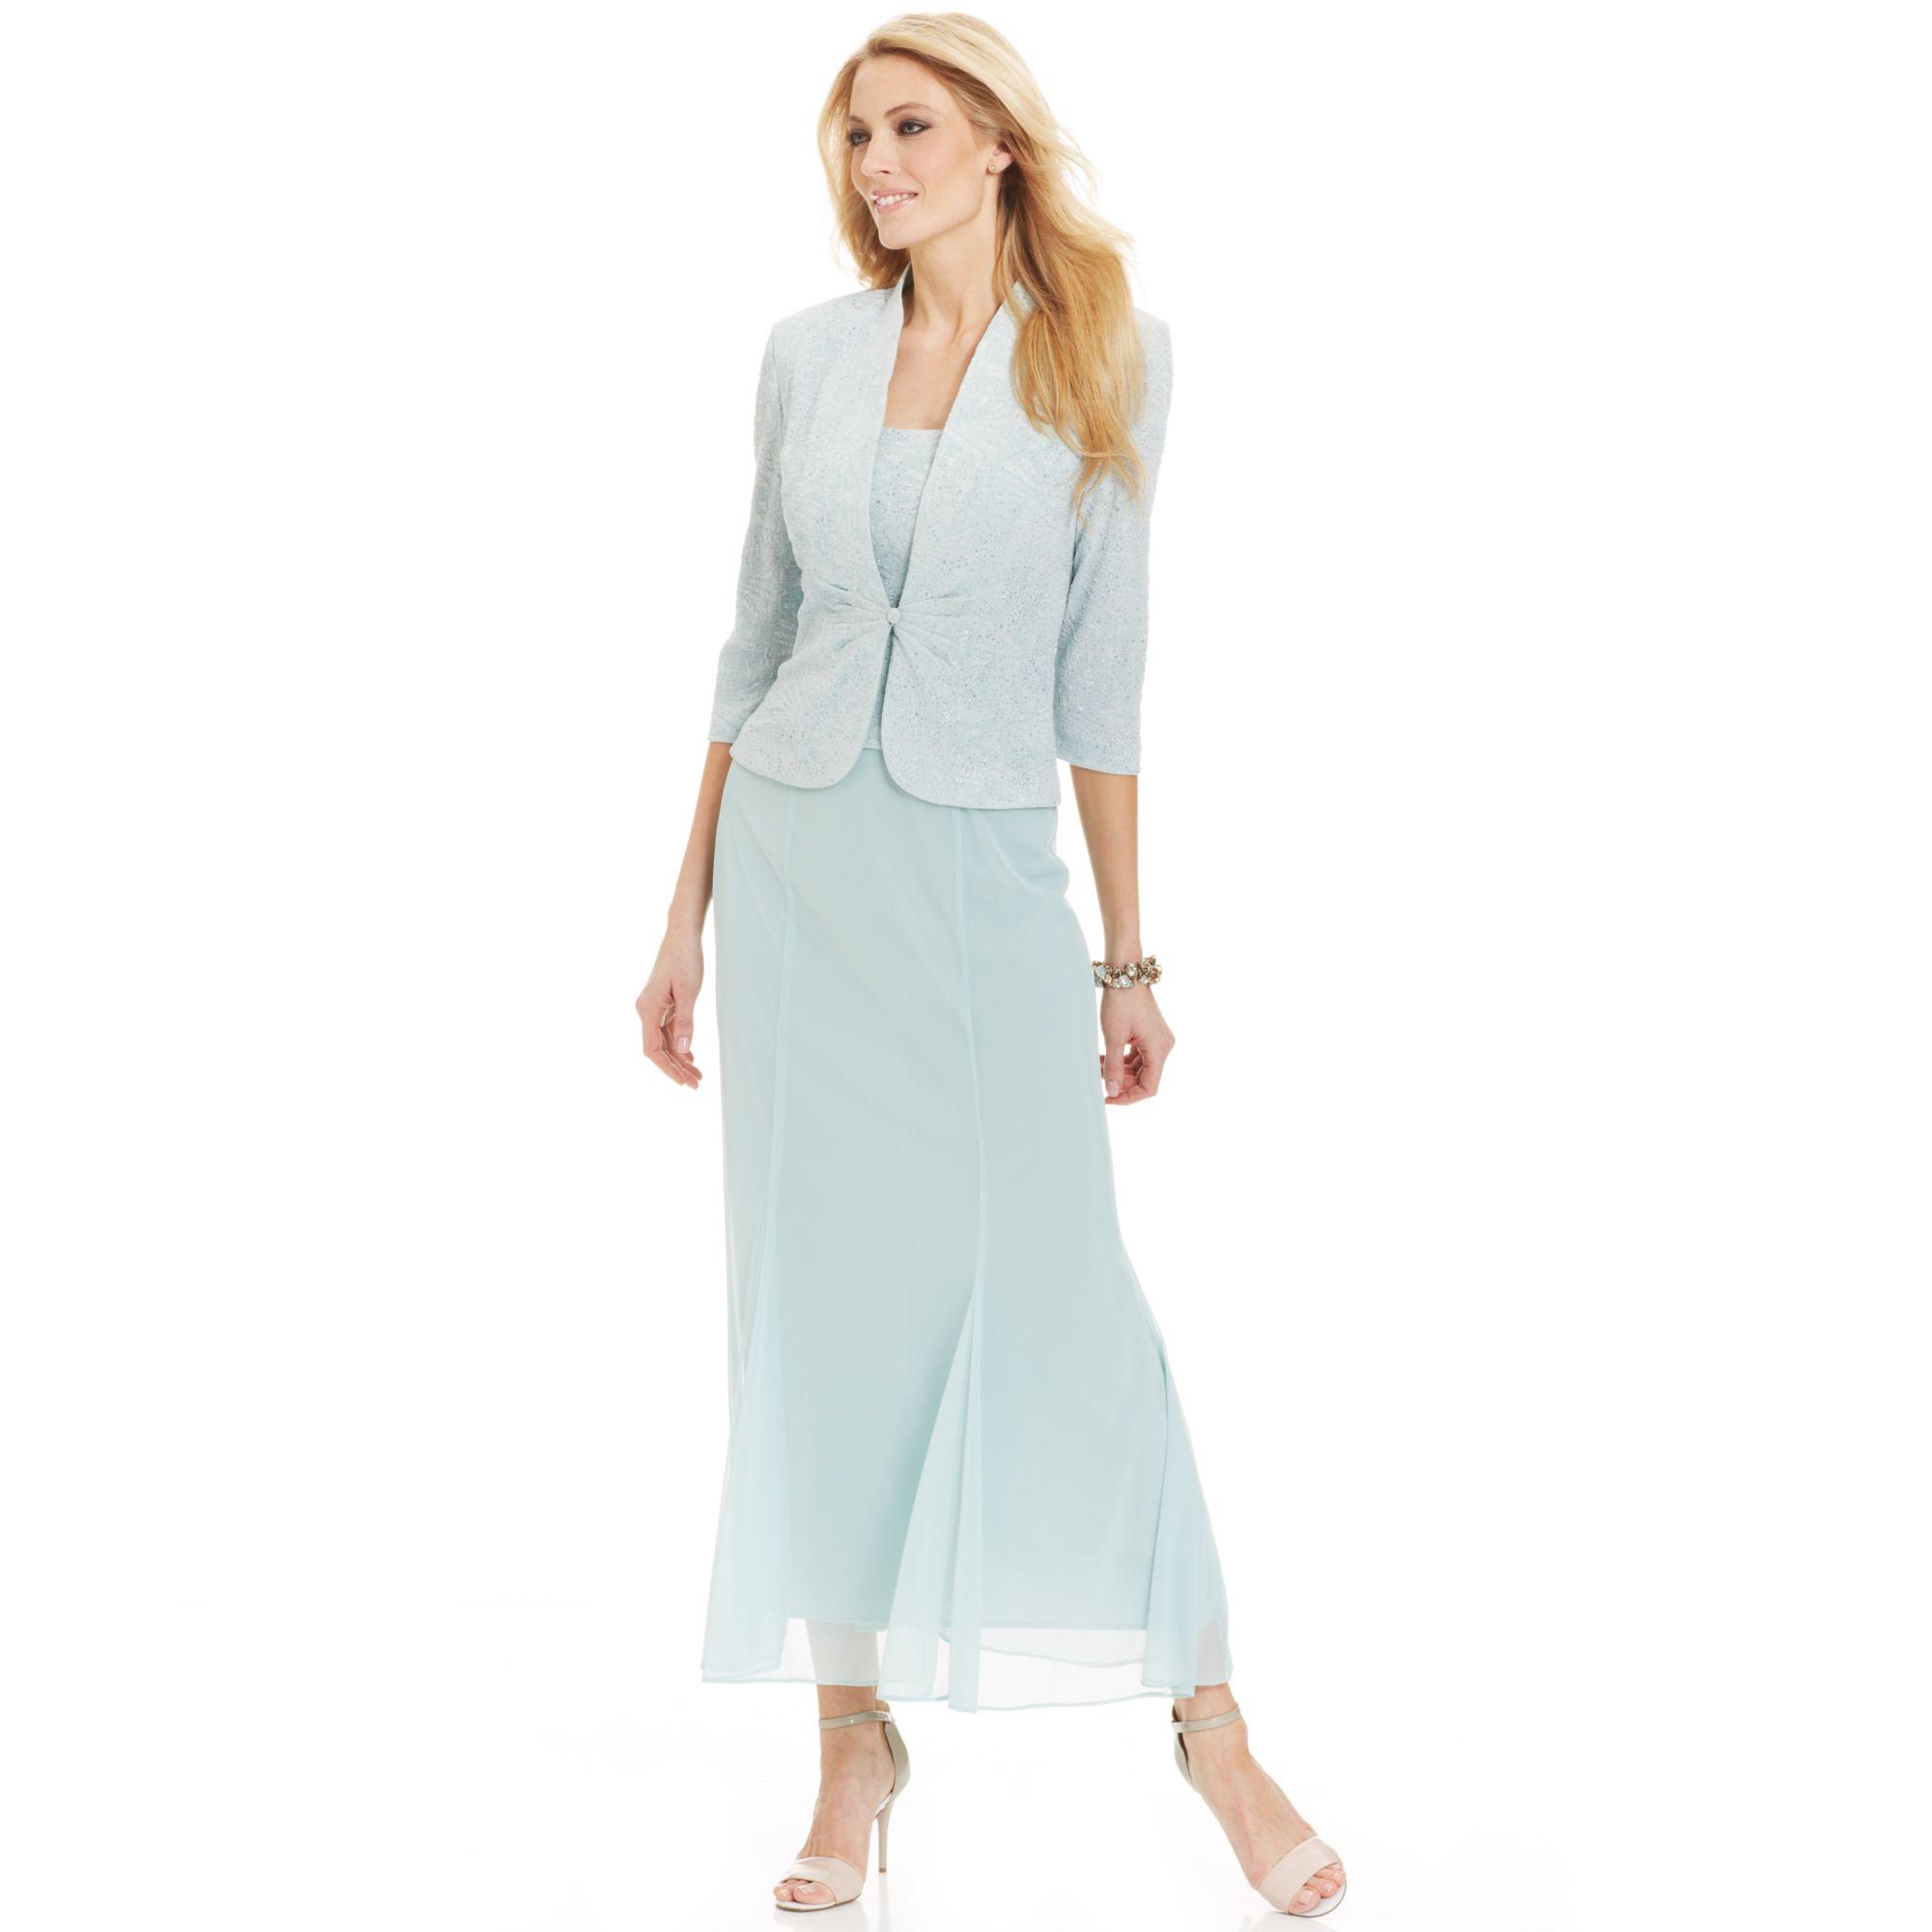 Jacquard-patterned dress - Natural white - Ladies | H&M IE